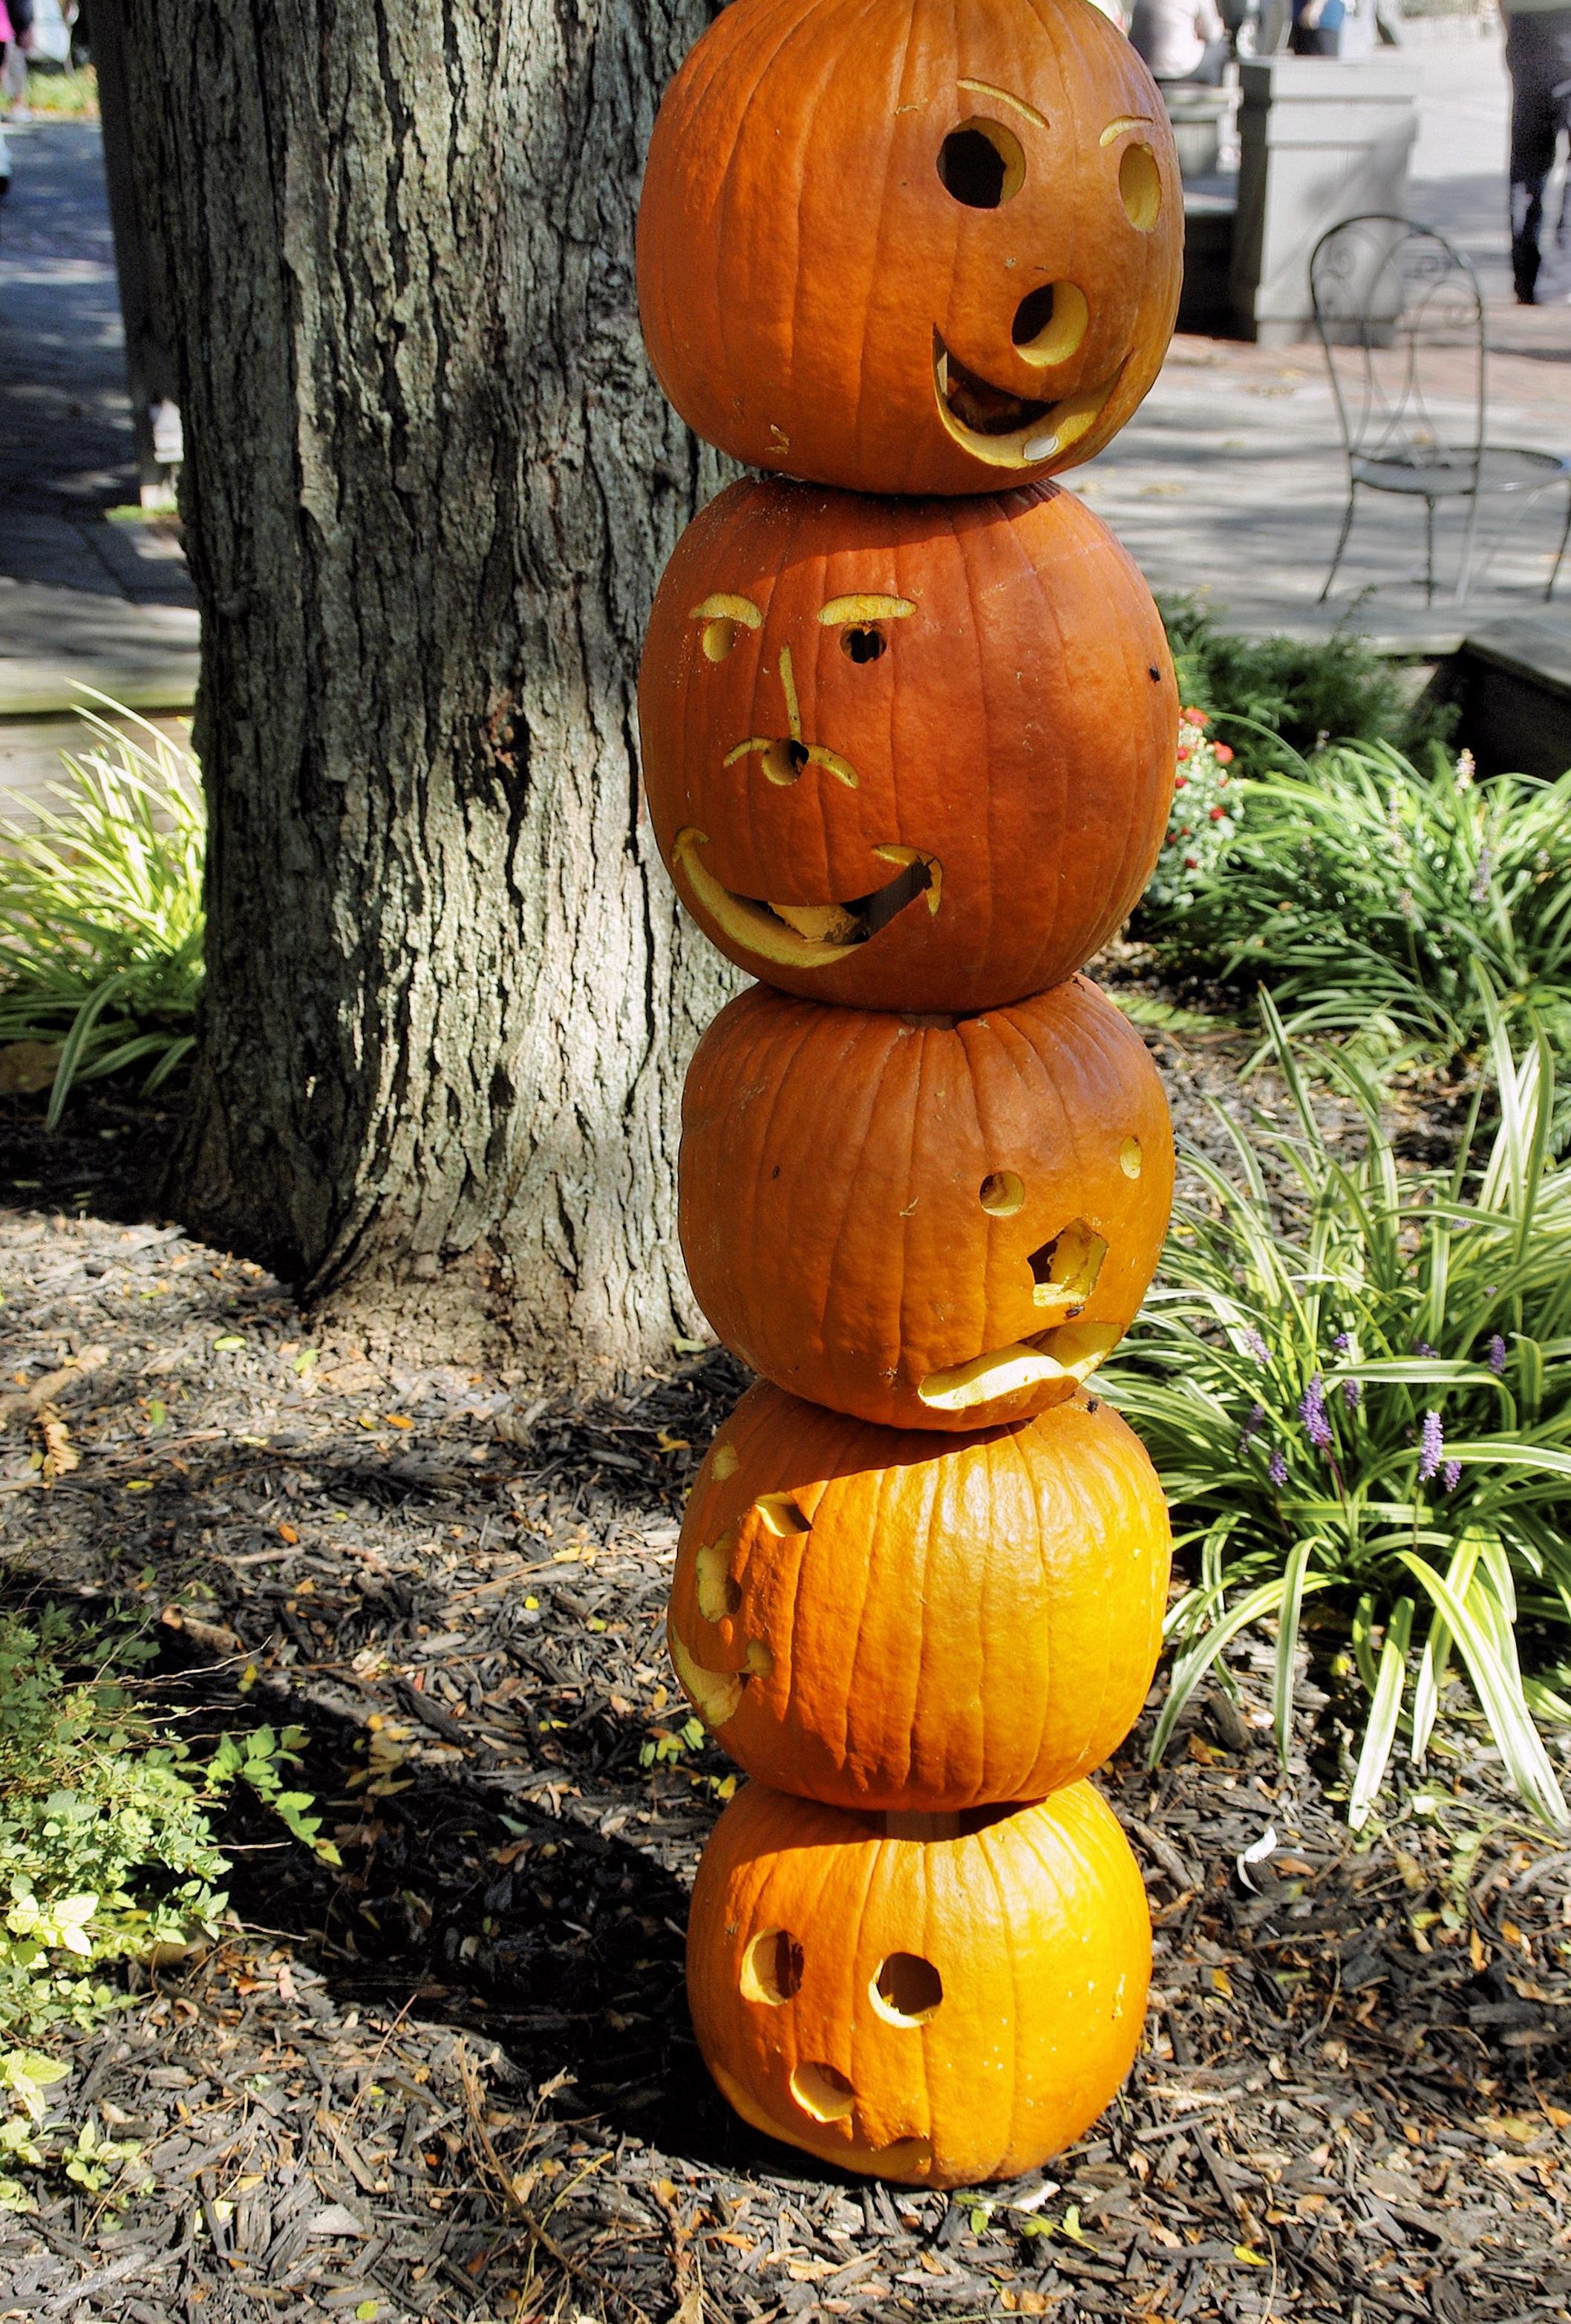 Free Images : autumn, pumpkin, halloween, usa, holiday, yellow ...